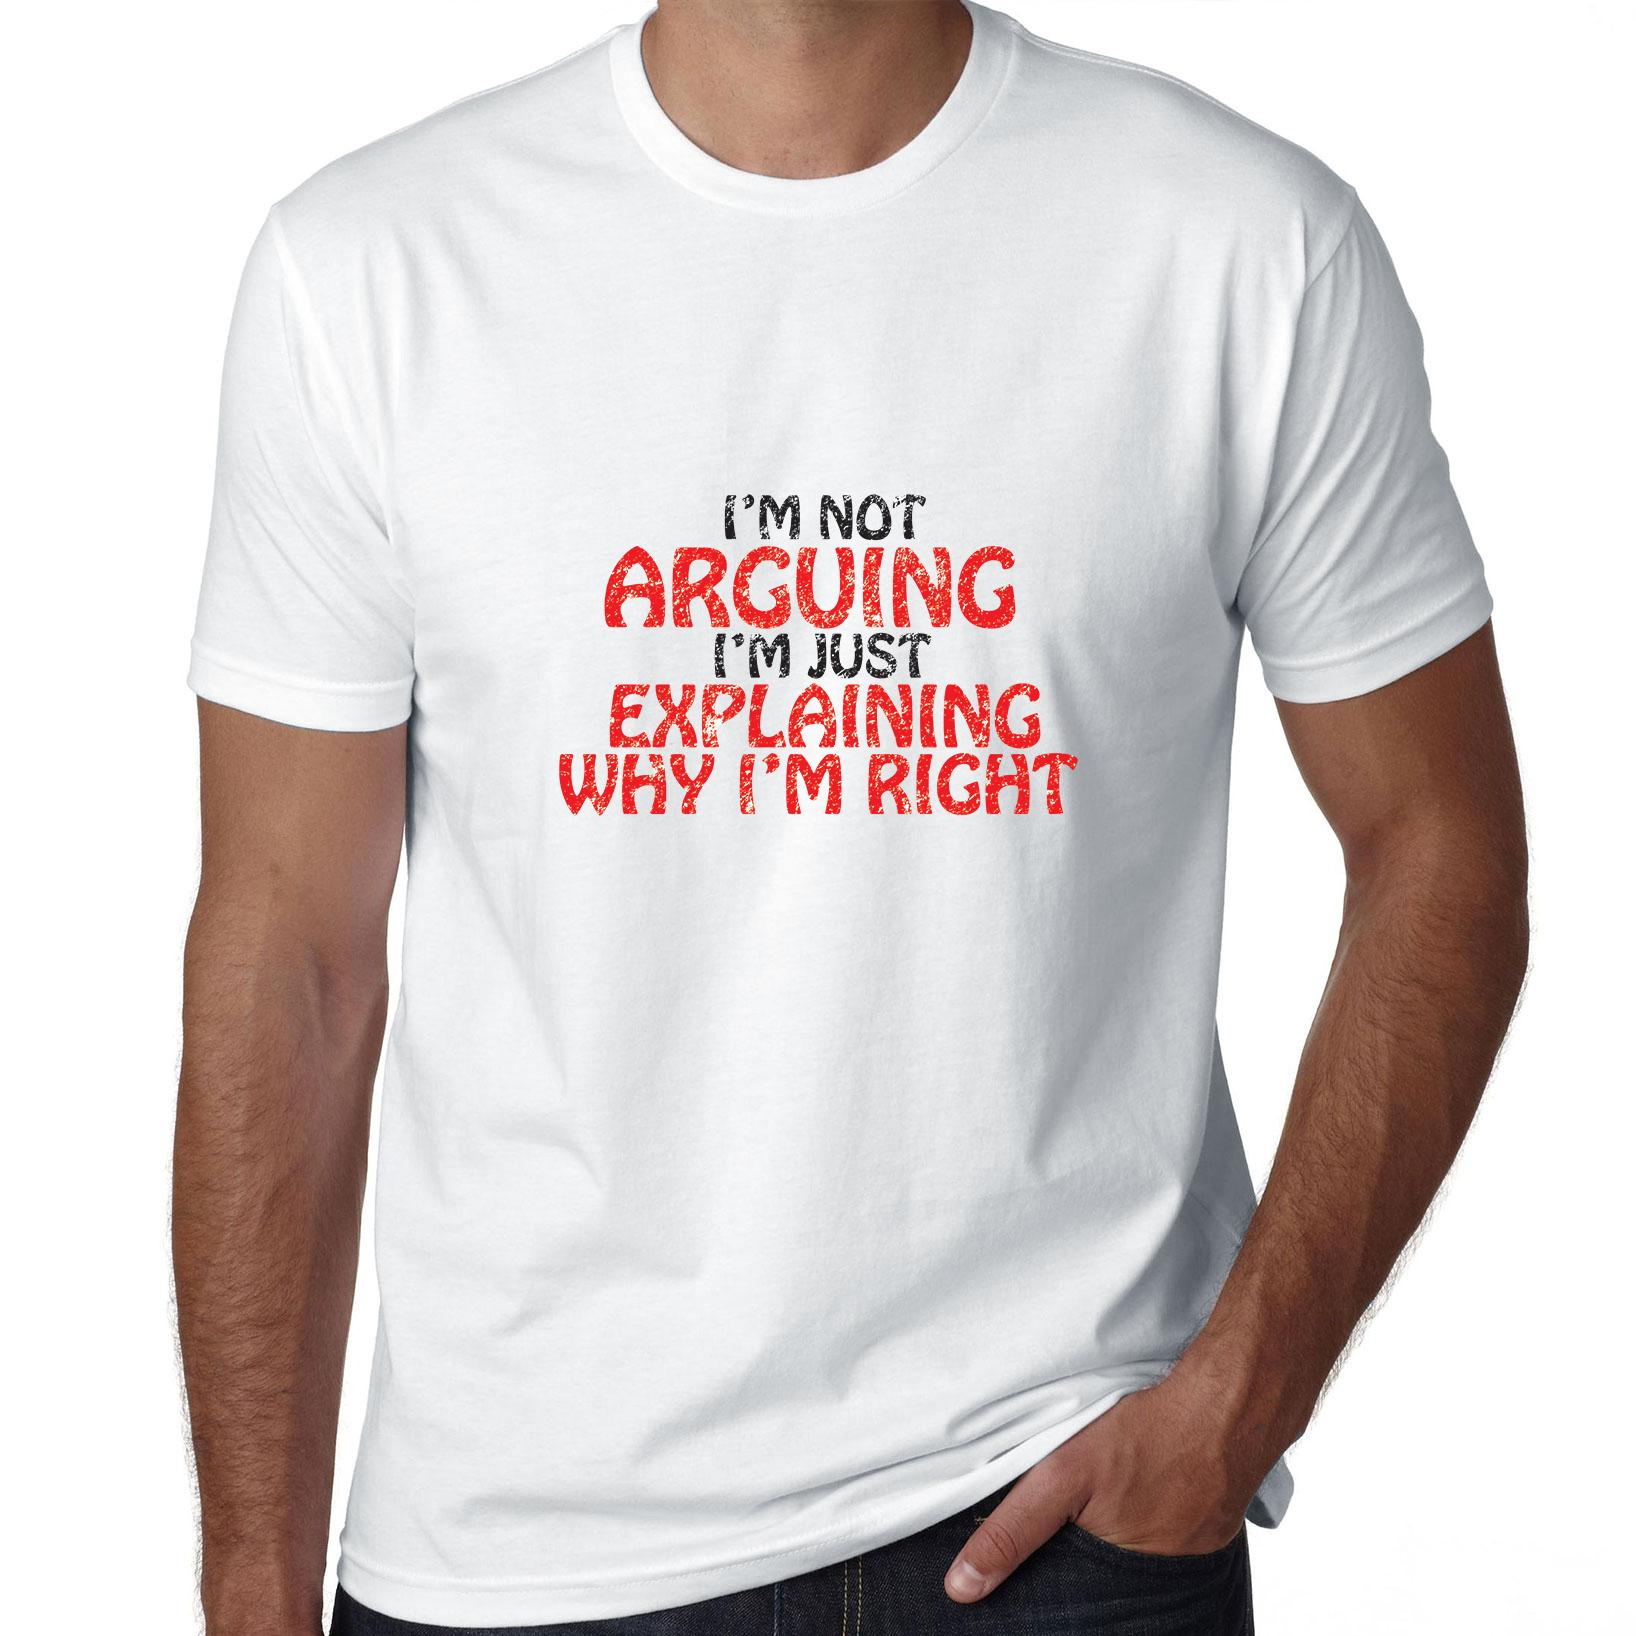 I'm Not Arguing I'm Just Explaining Why I'm Right Men's T-Shirt